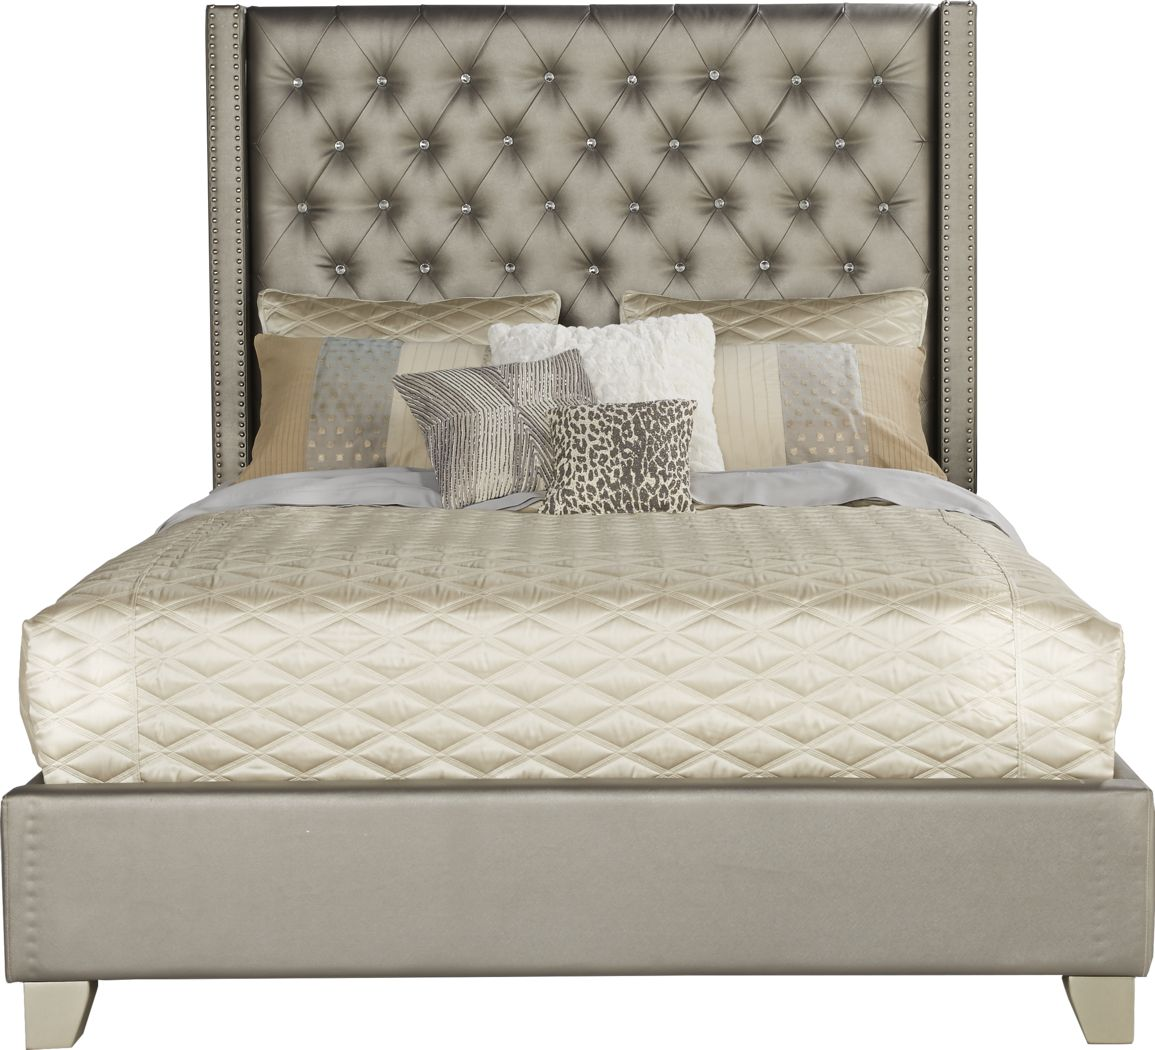 Sofia Vergara Paris Silver 3 Pc Upholstered King Bed